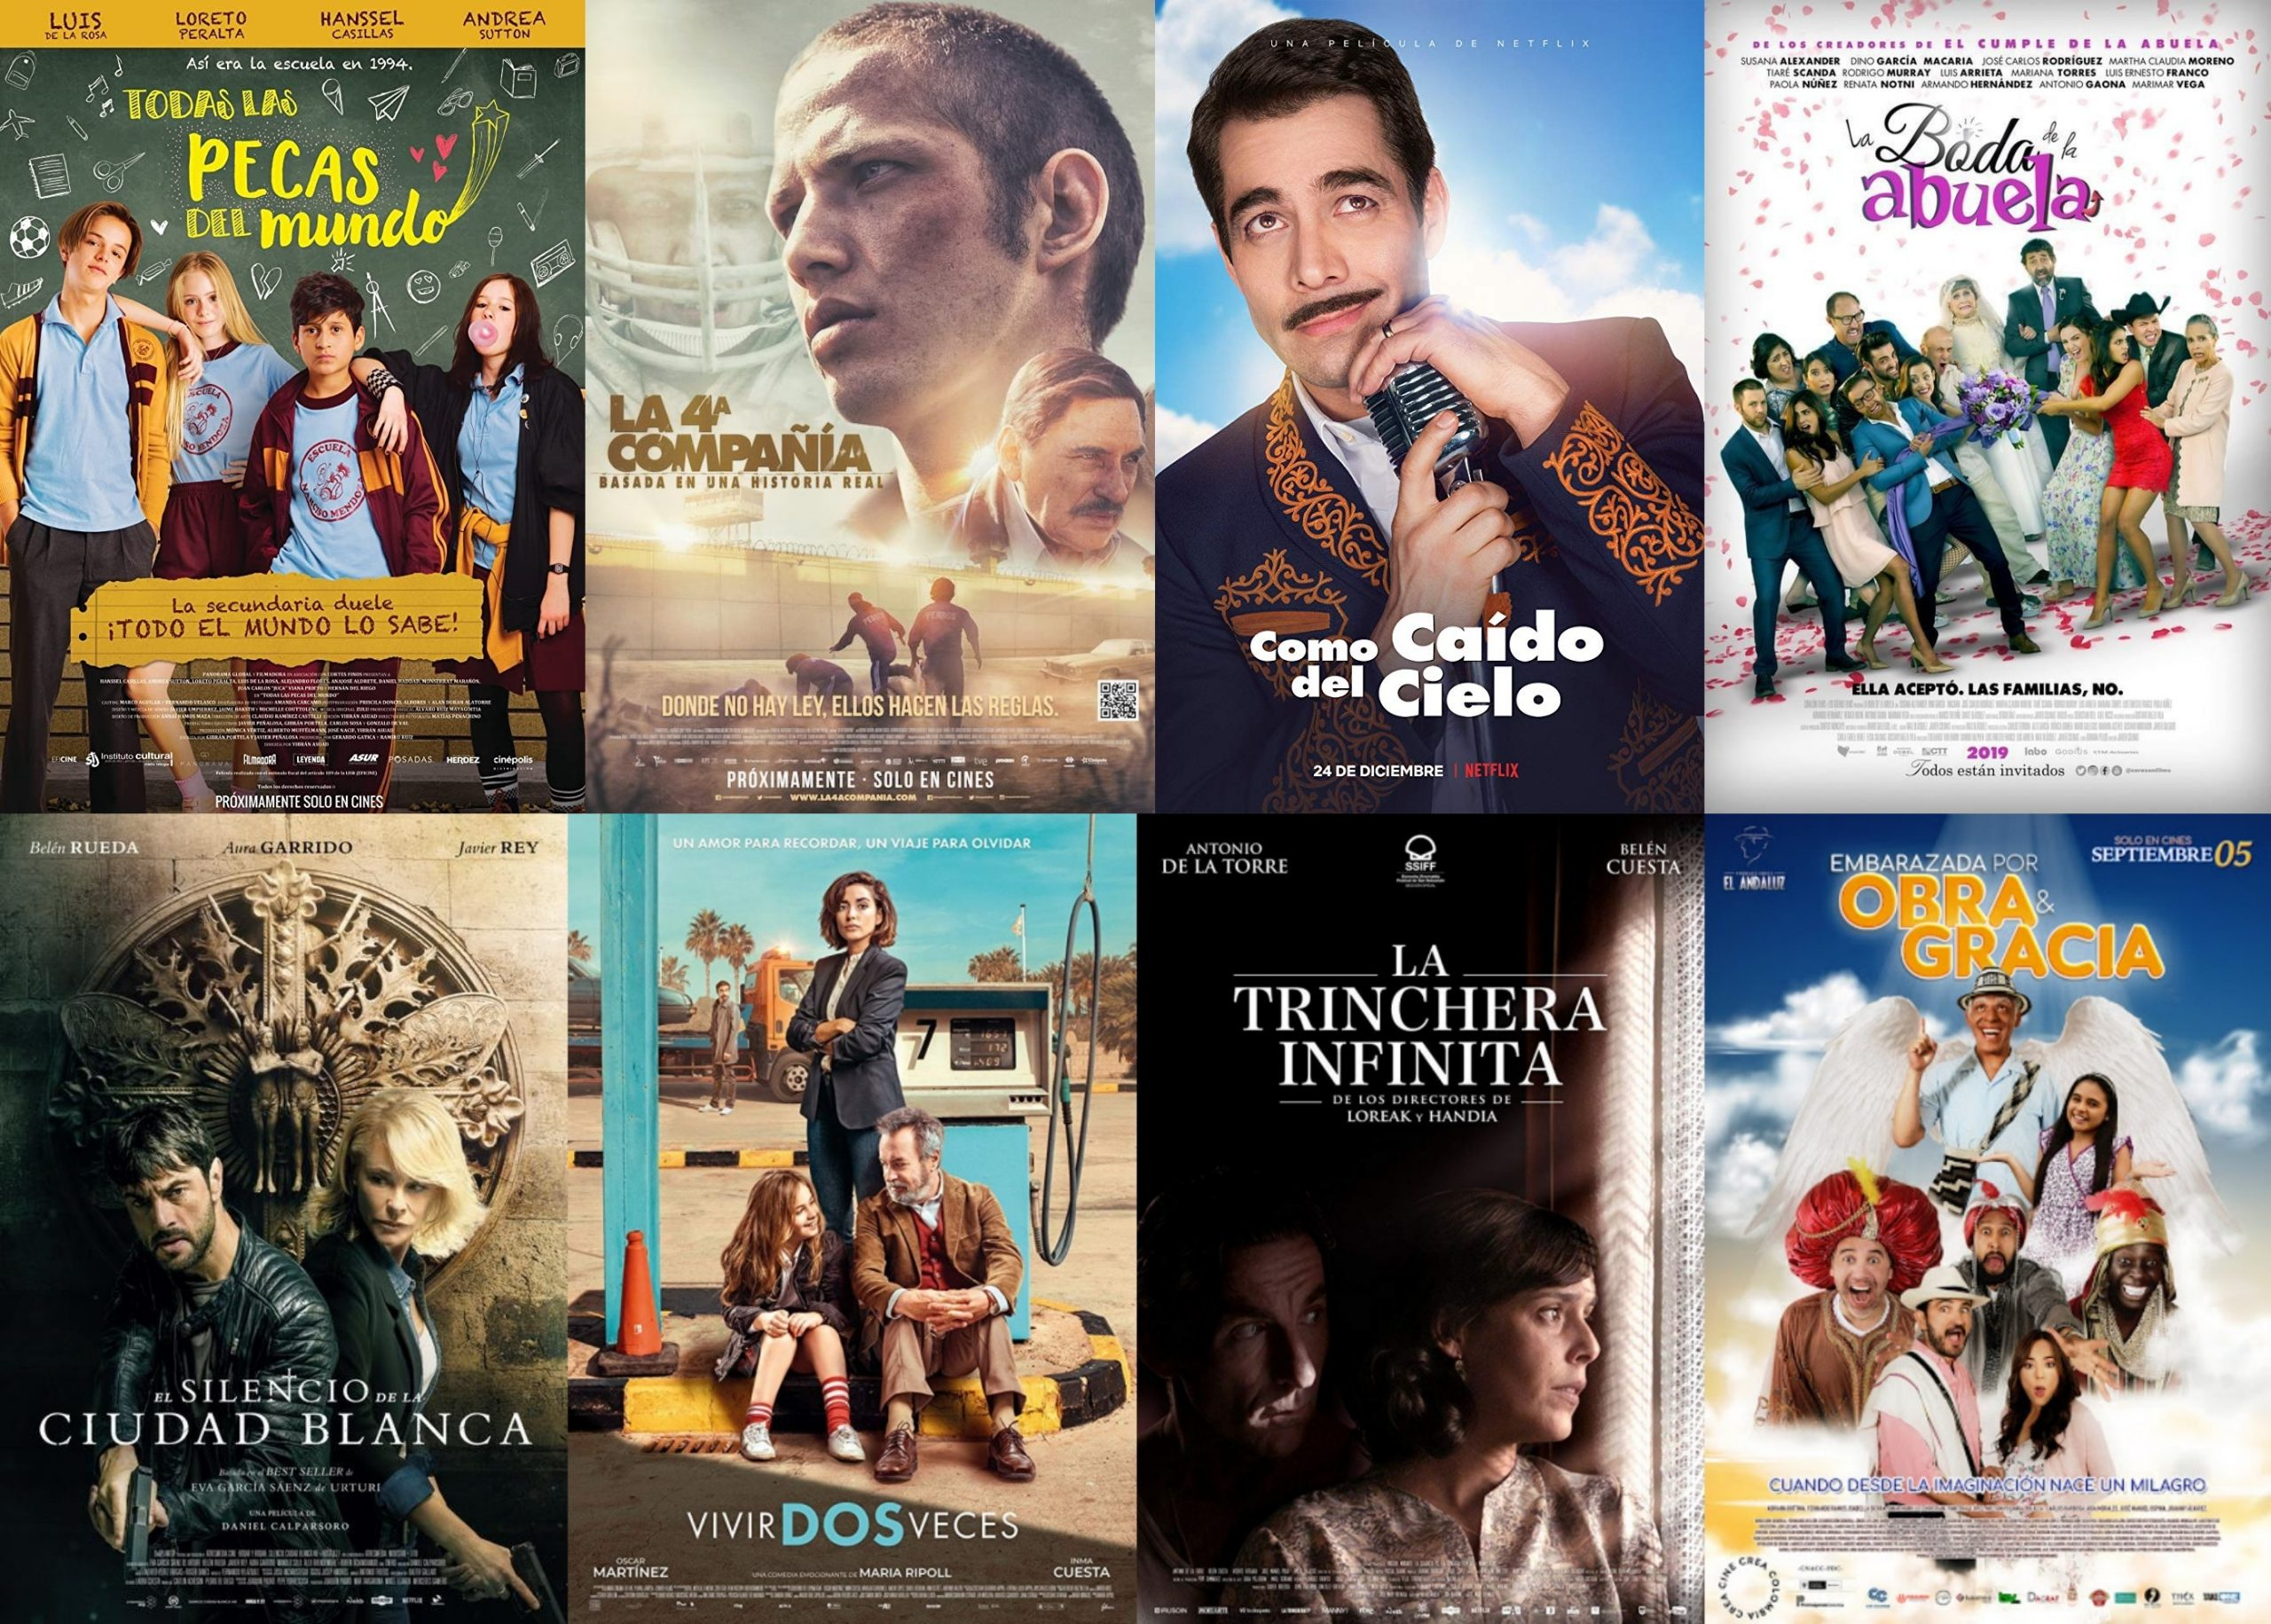 Netflixで言語設定を英語に変更すると視聴可能な映画(スペイン語映画編)